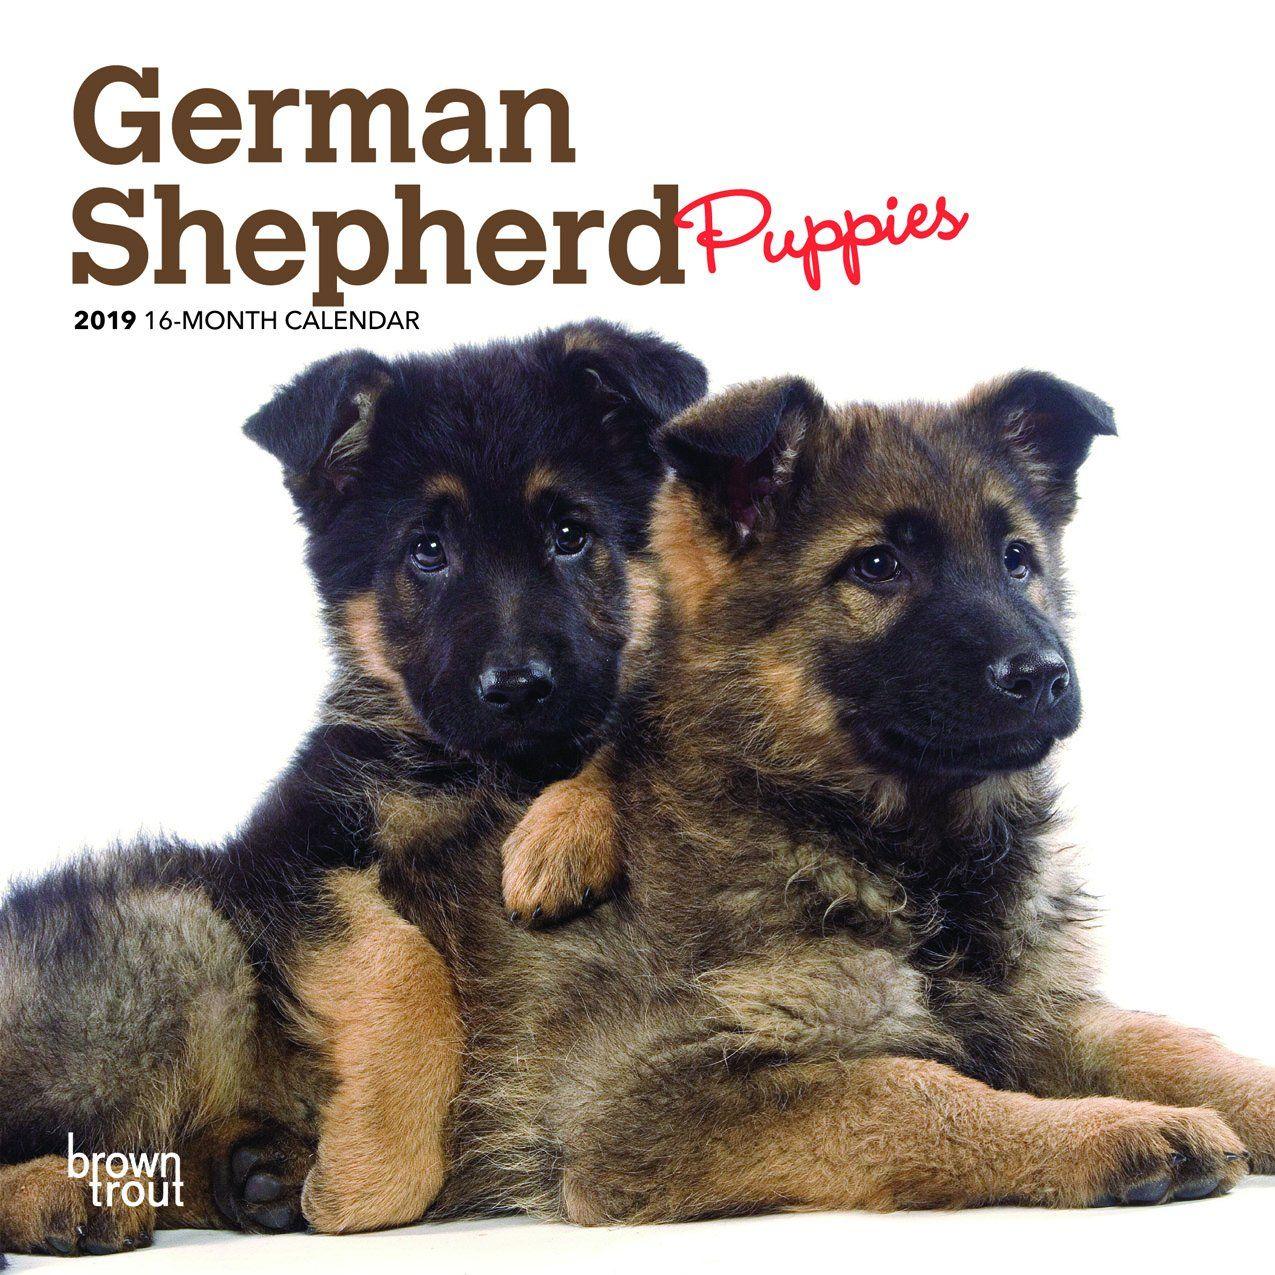 German shepherd puppies 2019 mini wall calendar german